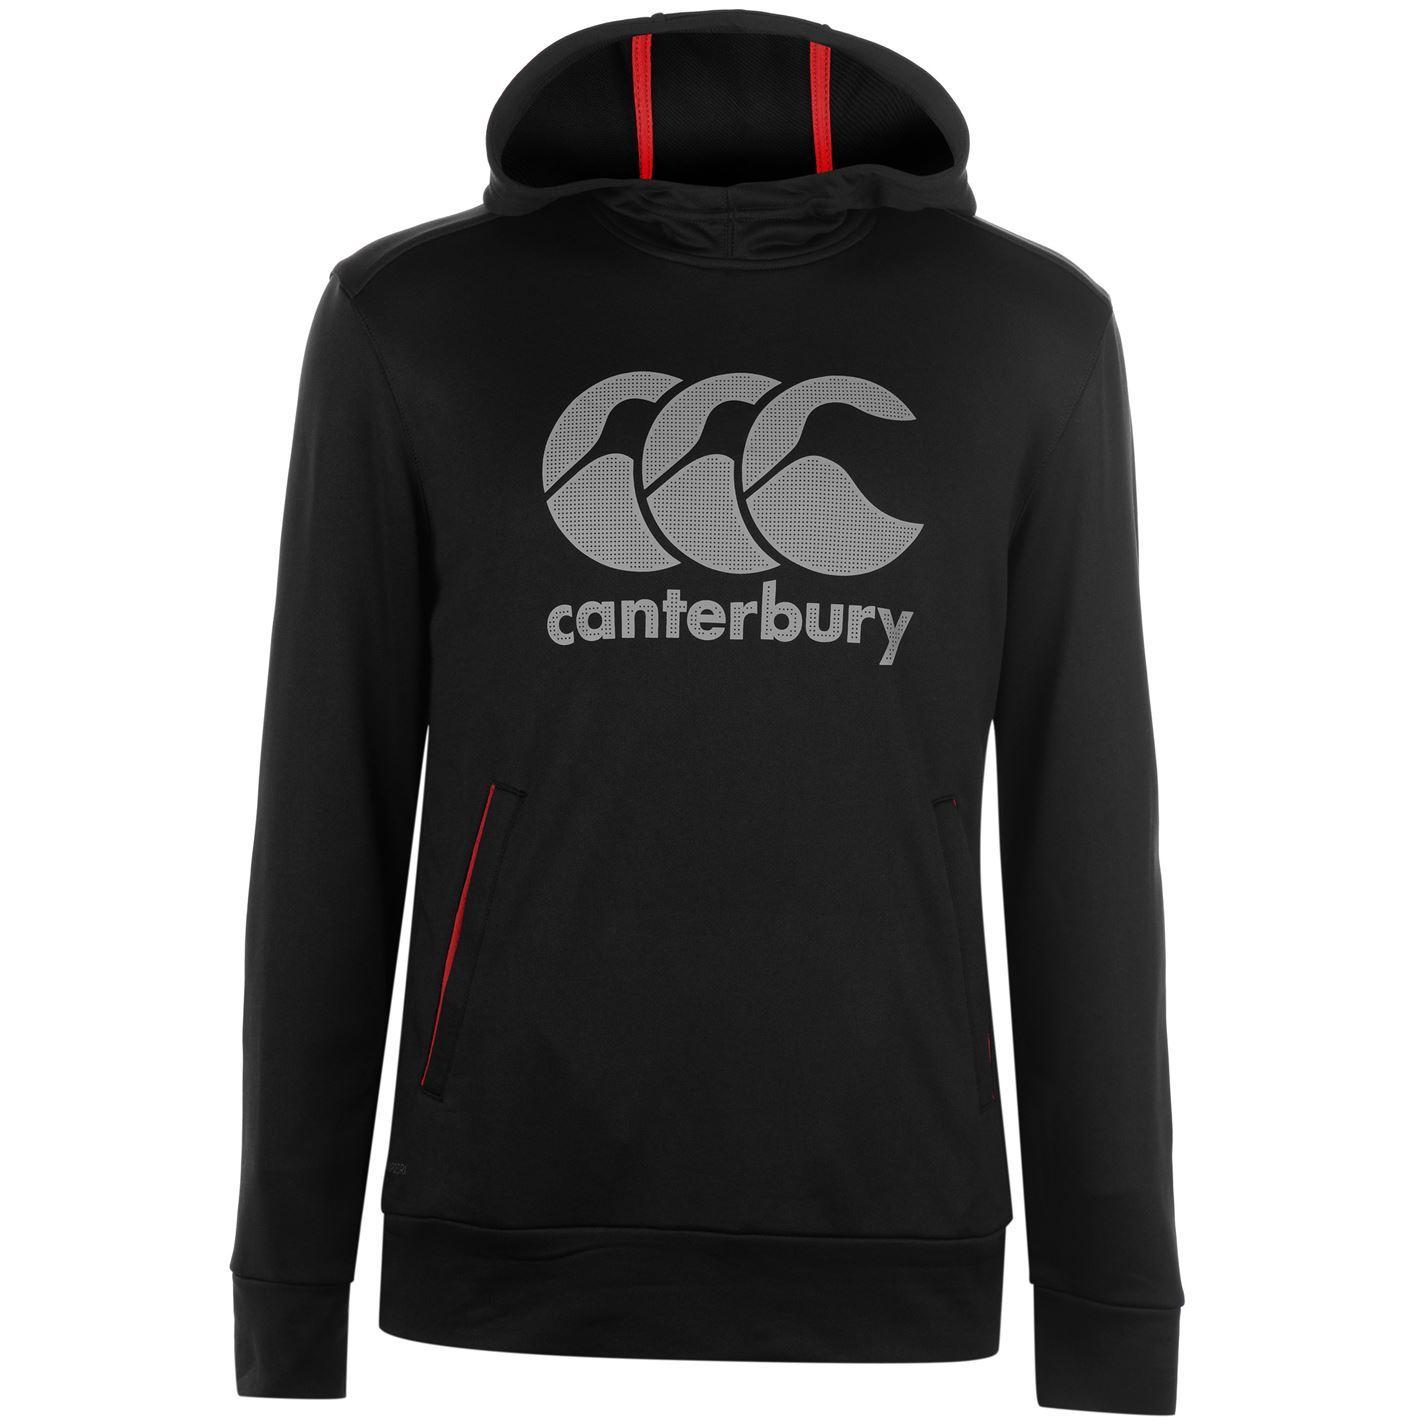 Canterbury-Mens-Vapodri-Training-Hoody-Performance-Jacket-Hoodie-